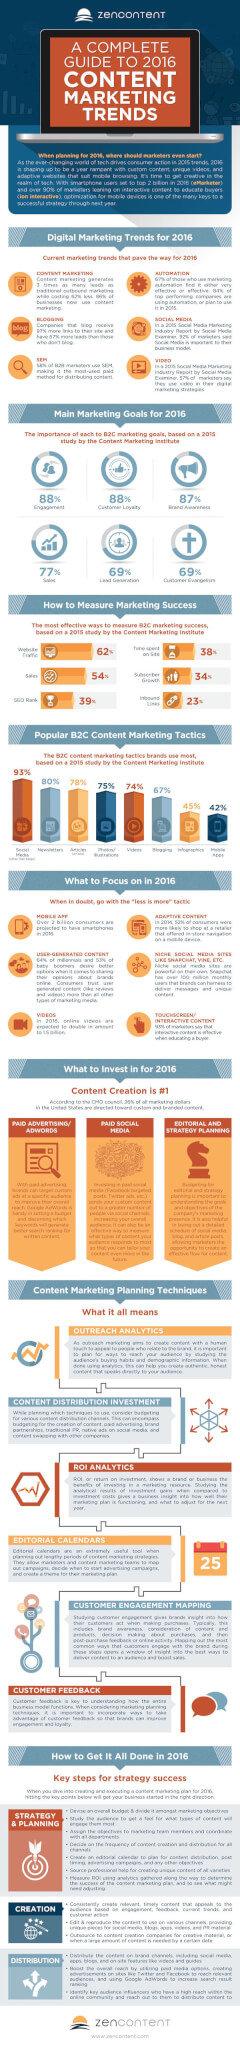 marketin-contenidos-2016-infografia